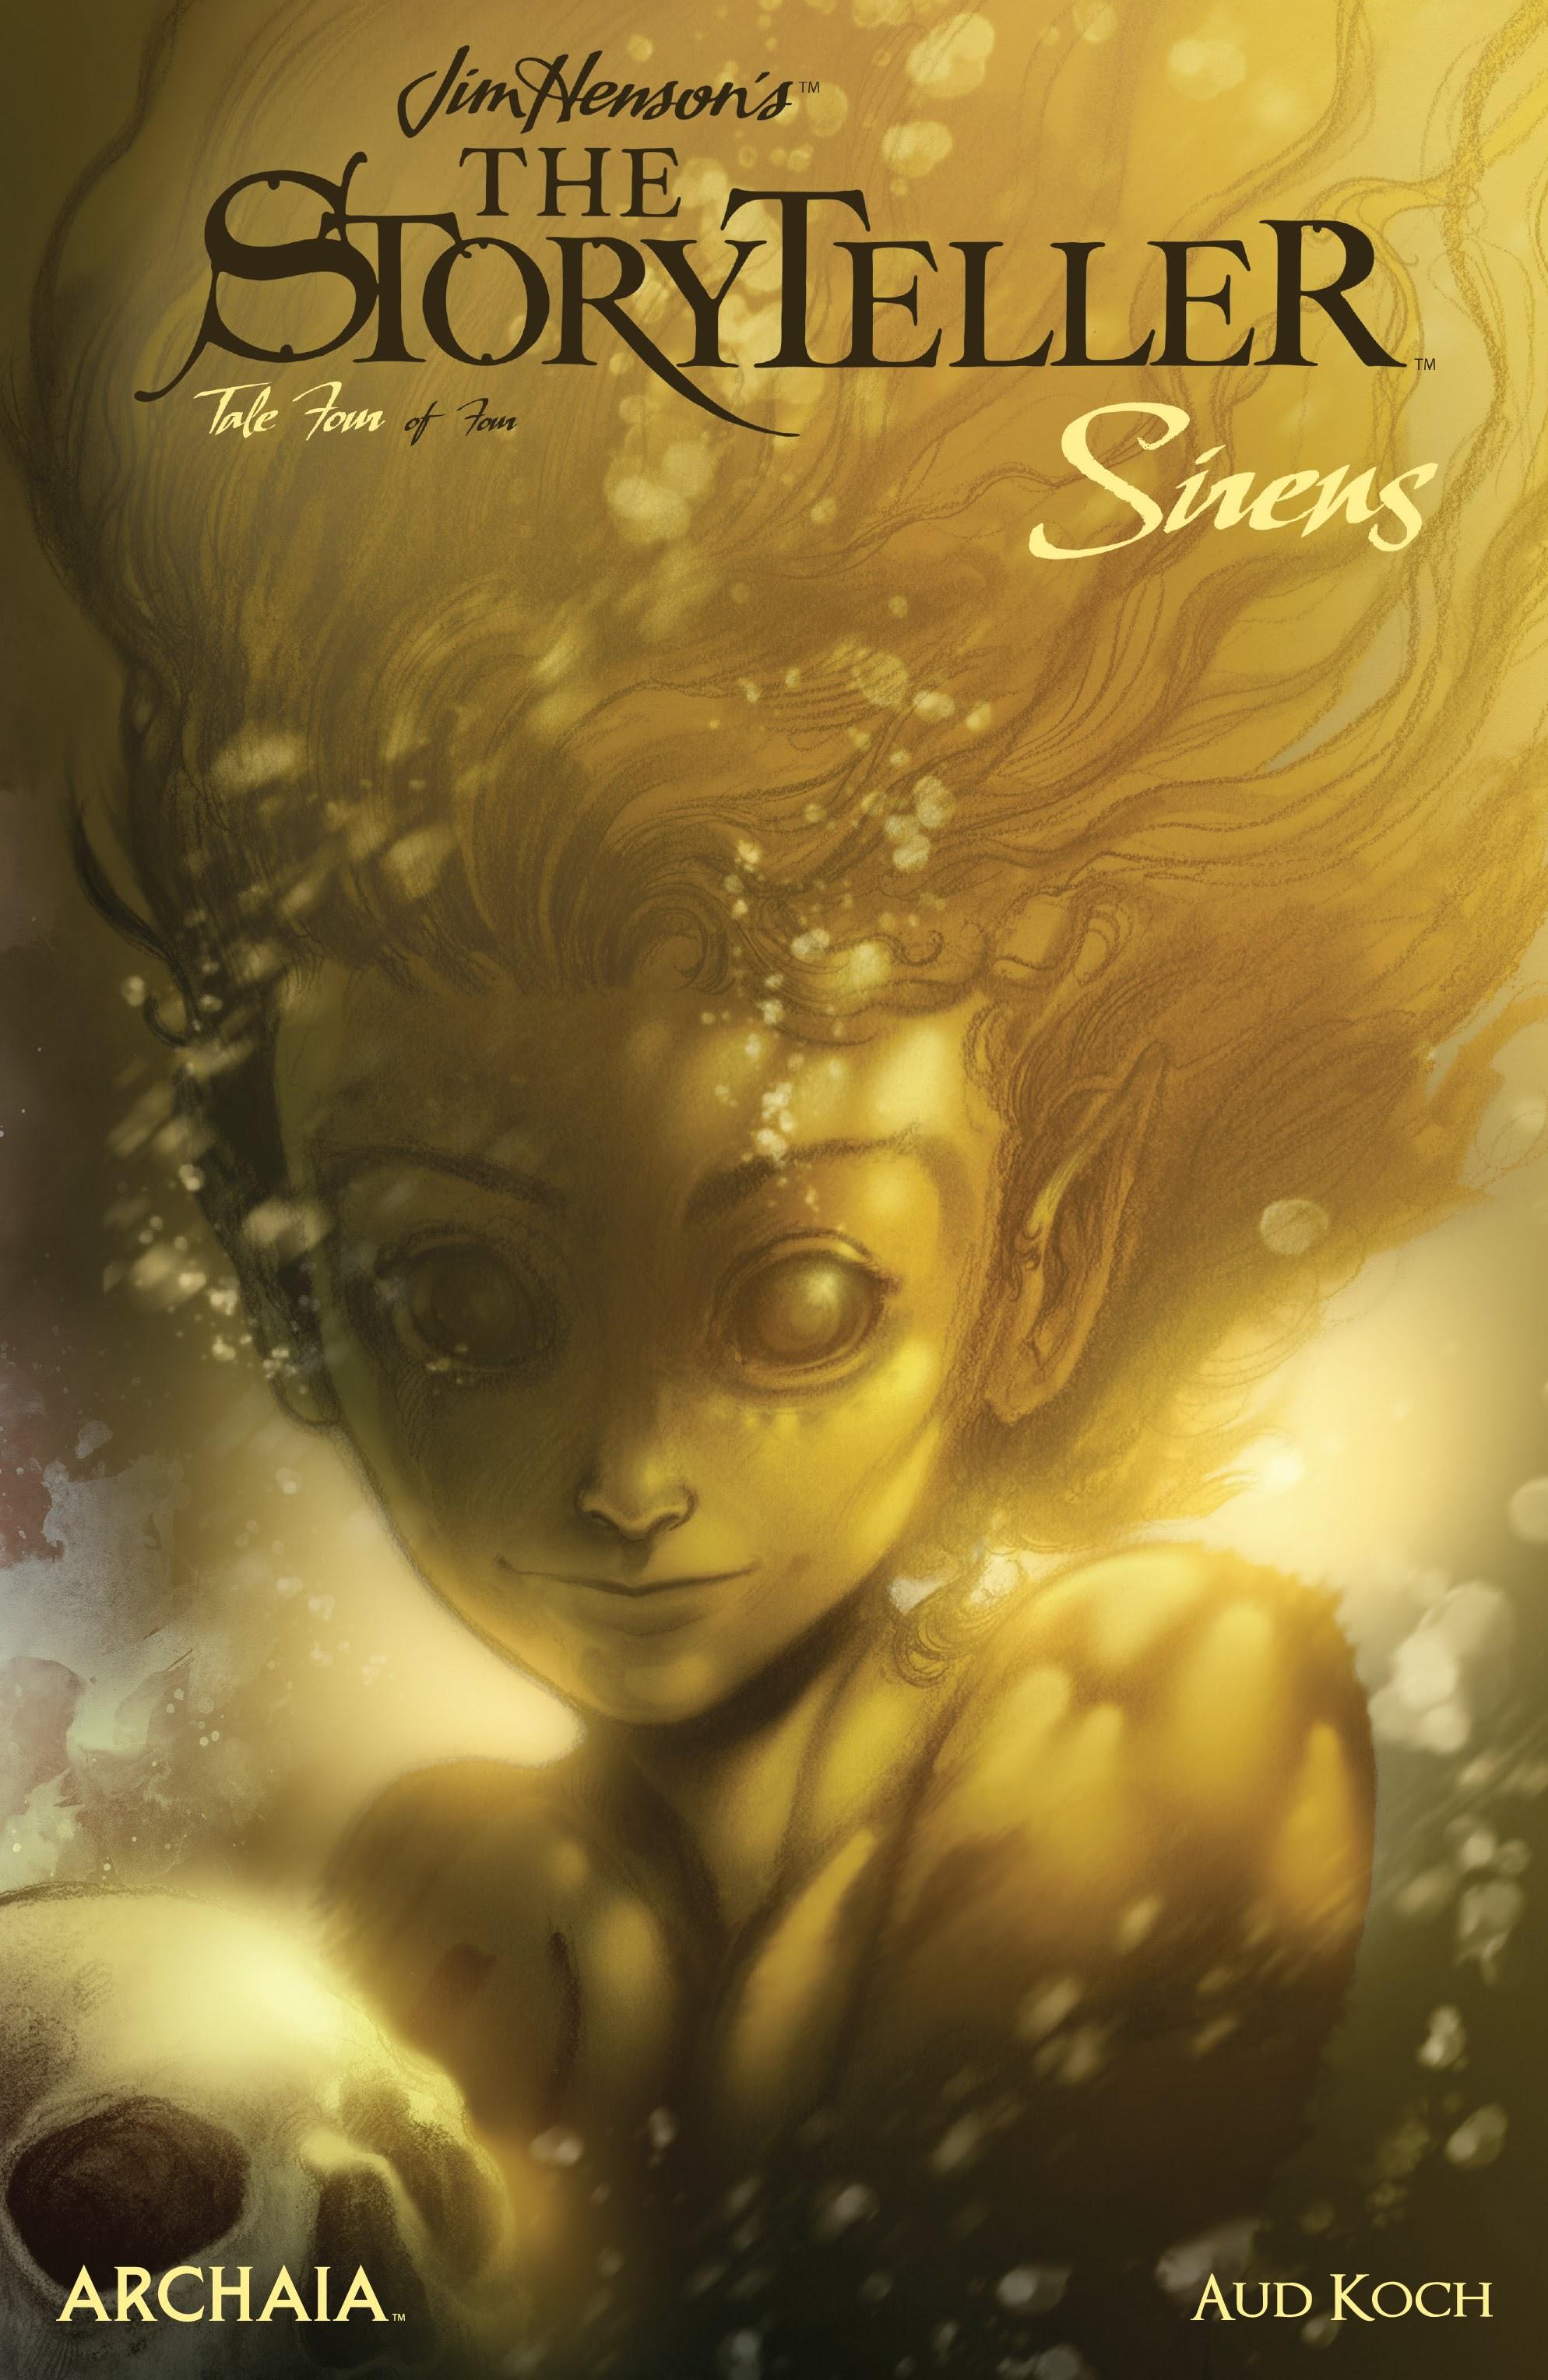 Jim Hensons The Storyteller: Sirens 4 Page 1